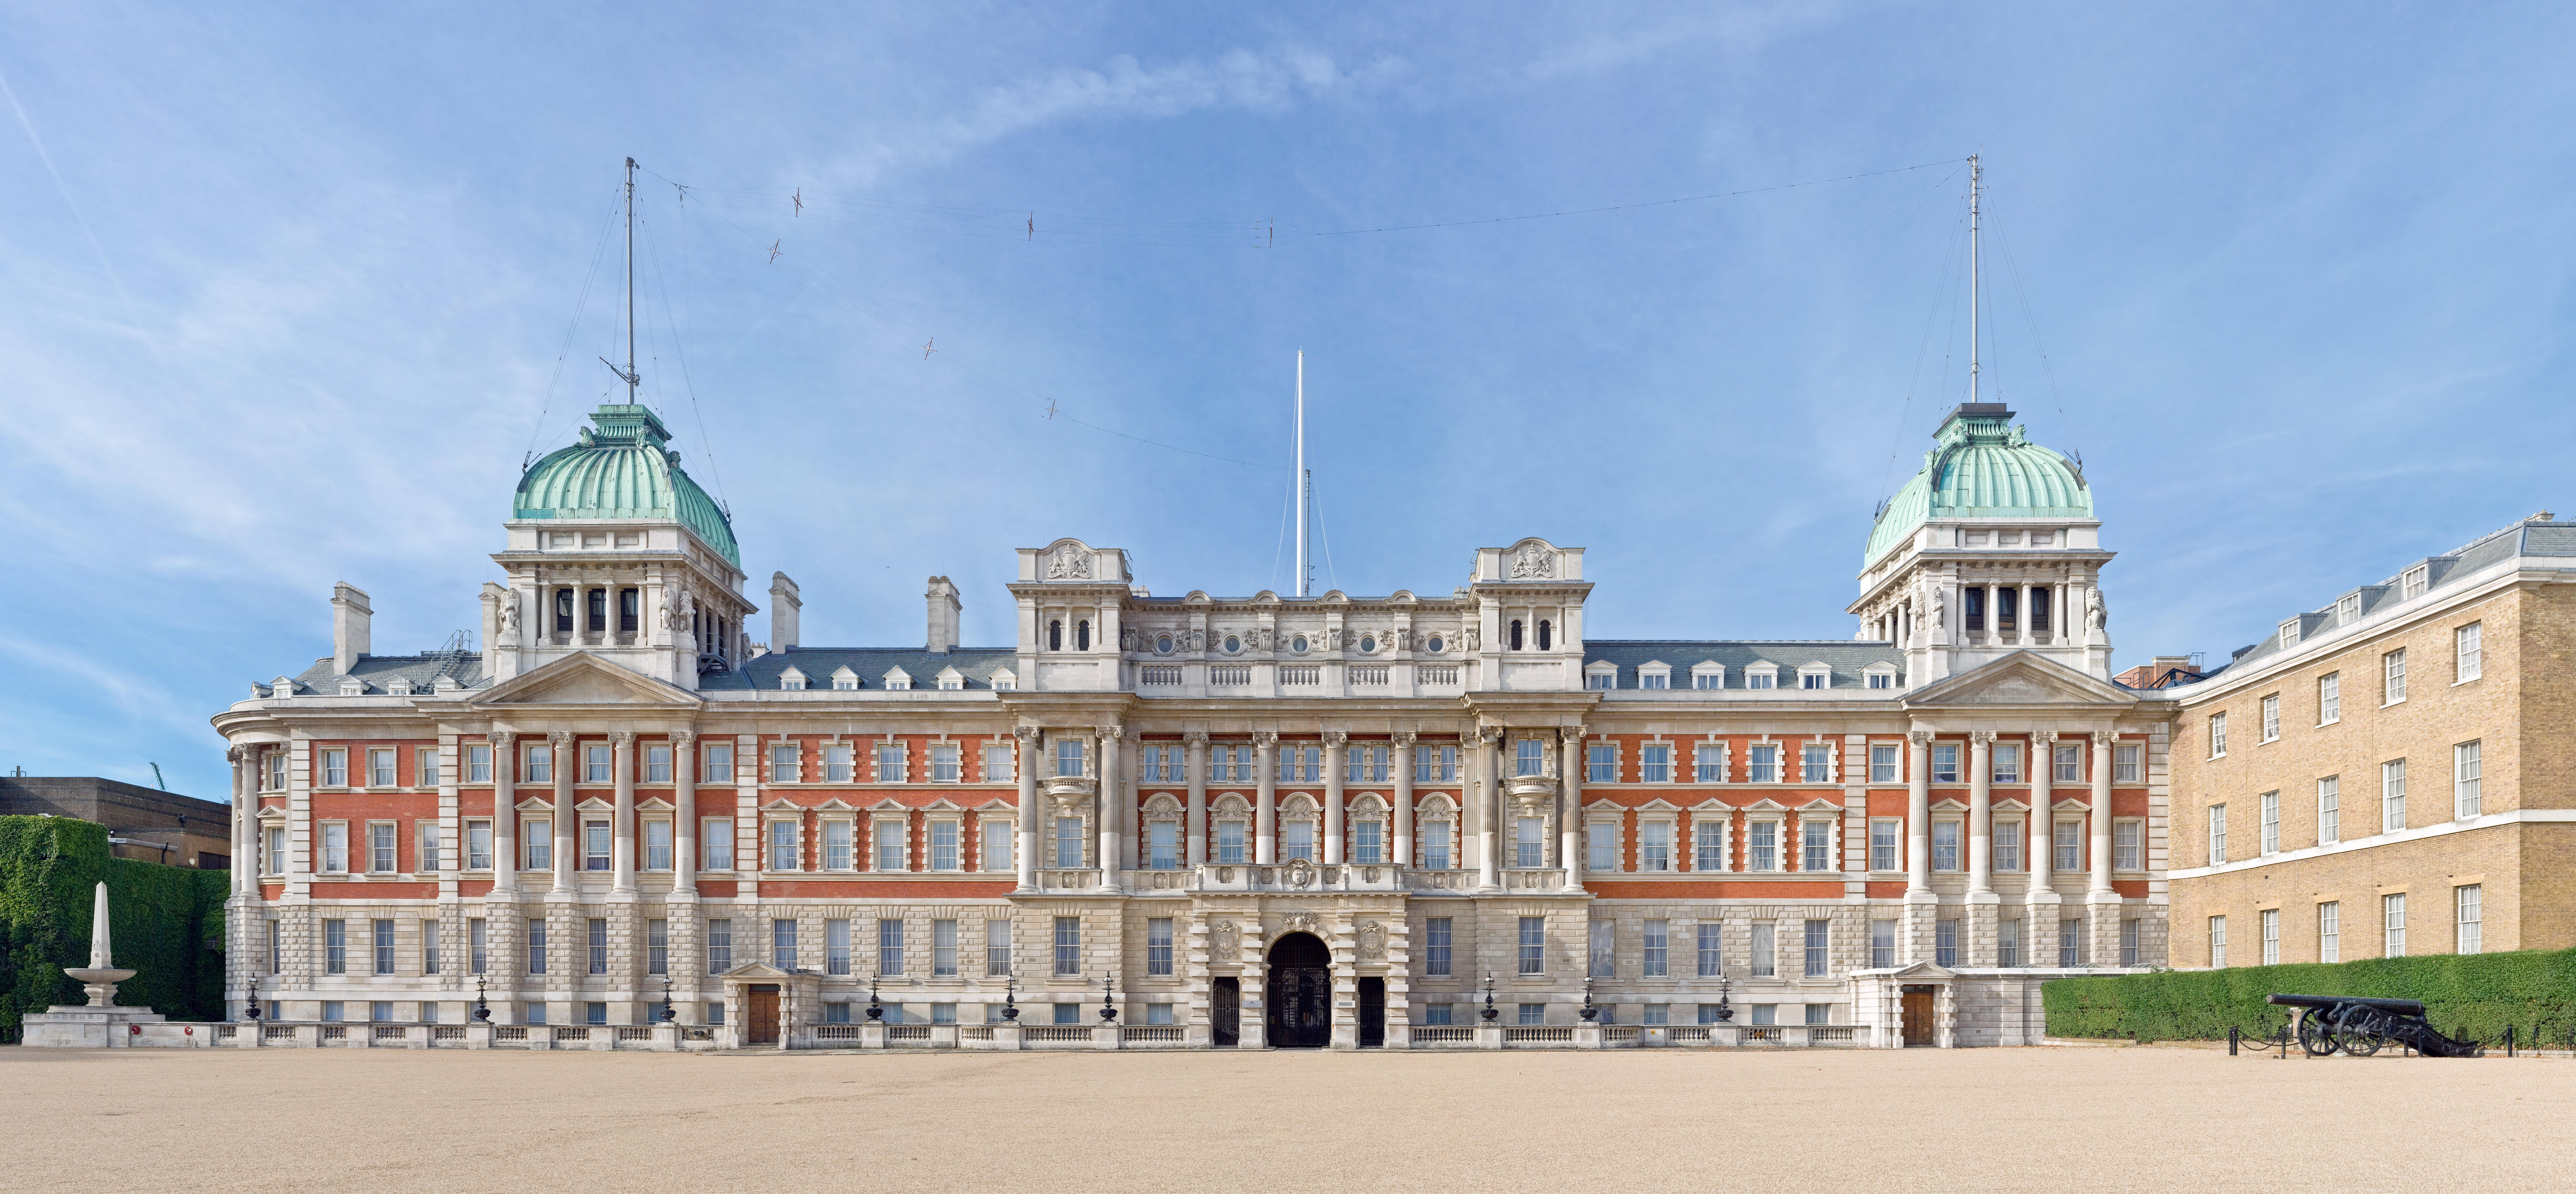 Royal Horseguards Hotel London England